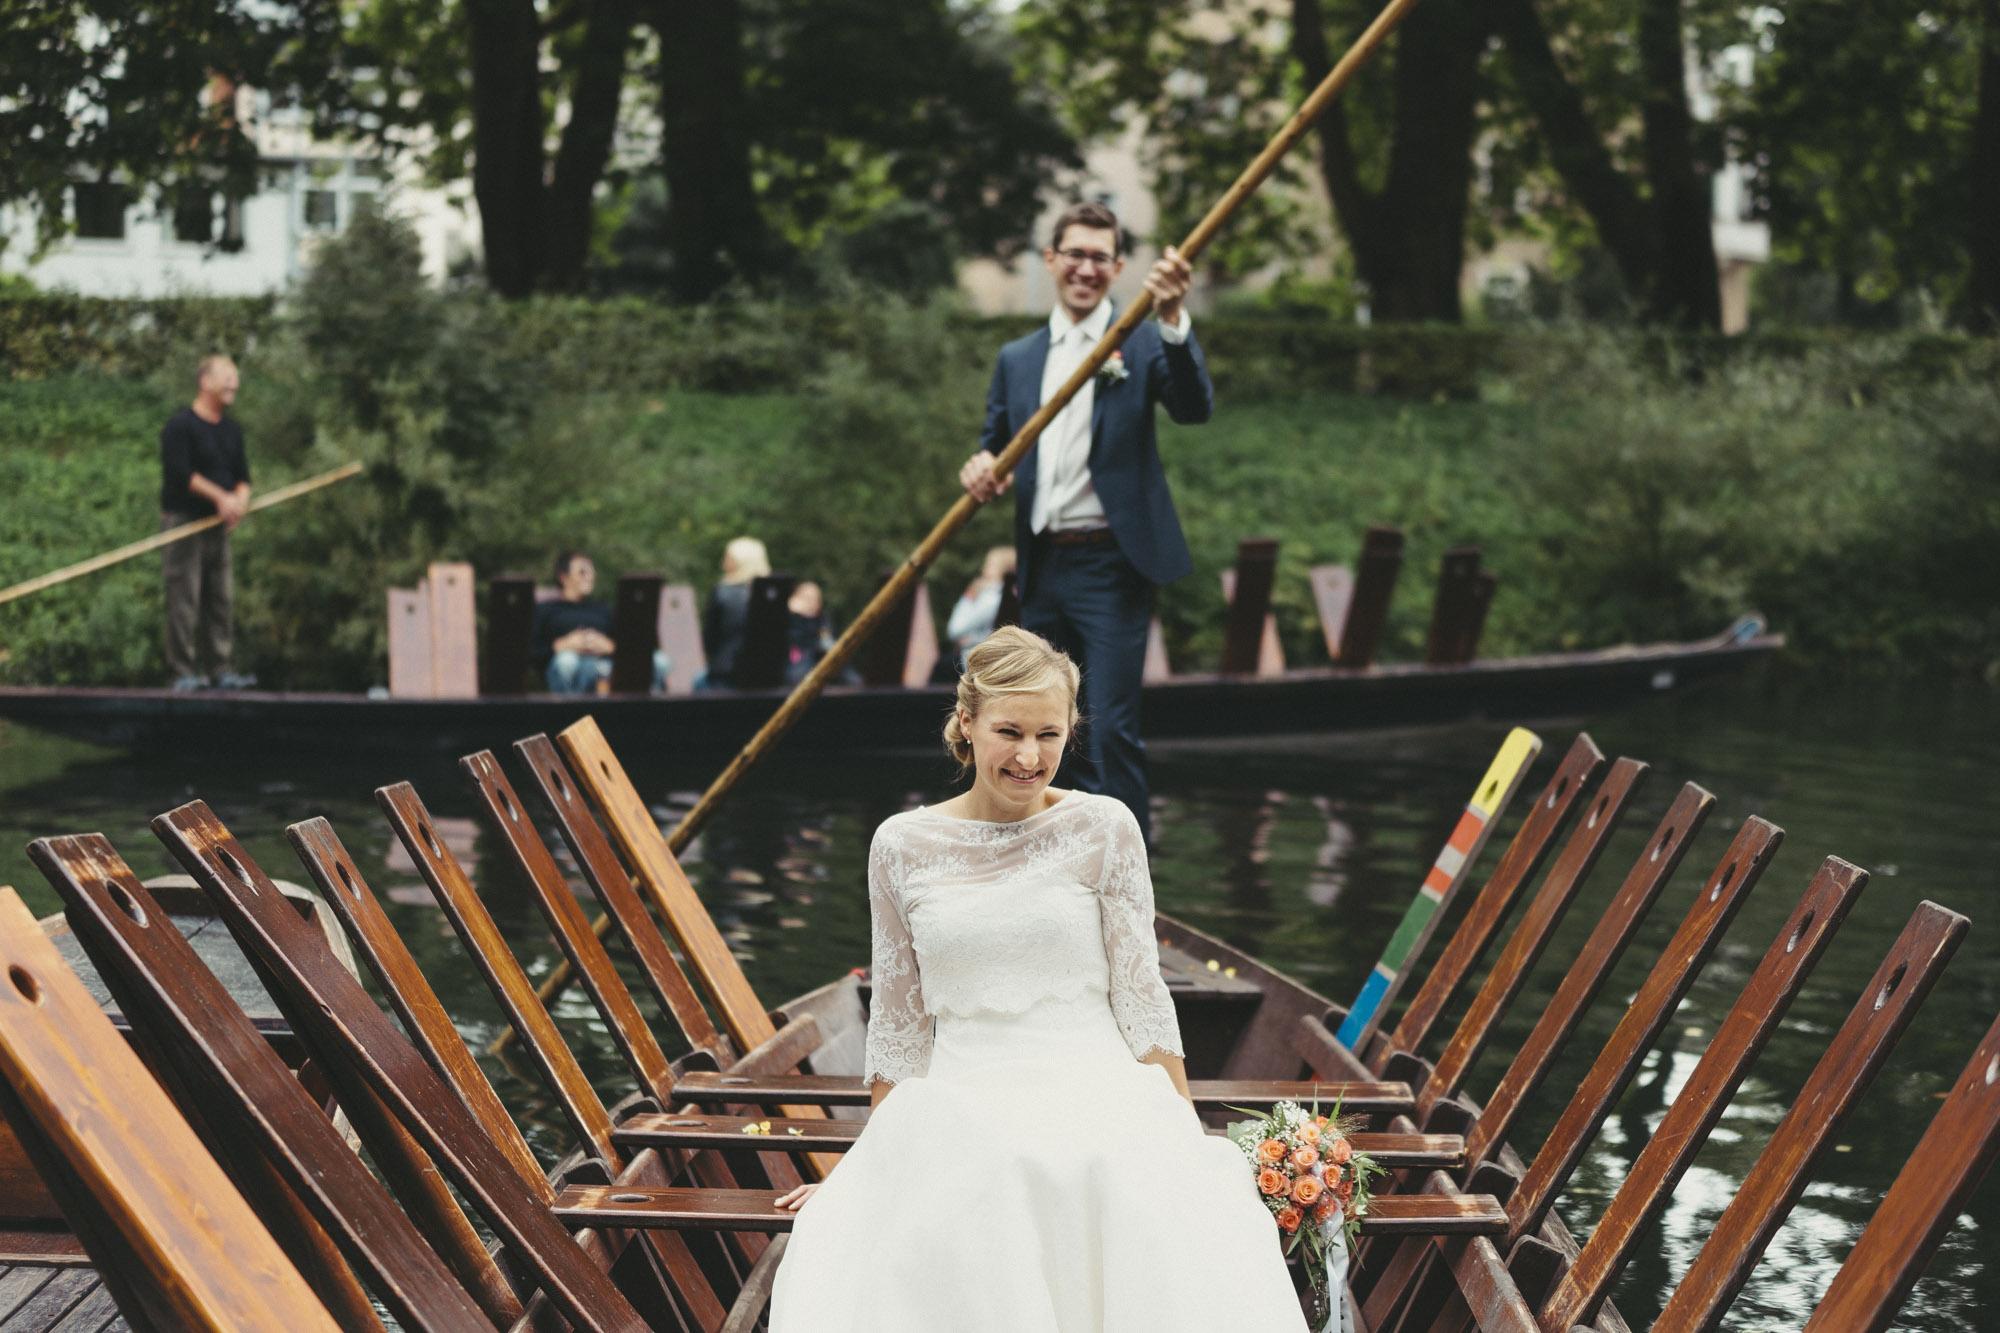 Hochzeitsfotografie-Tuebingen-Doro-Stefan-17-1